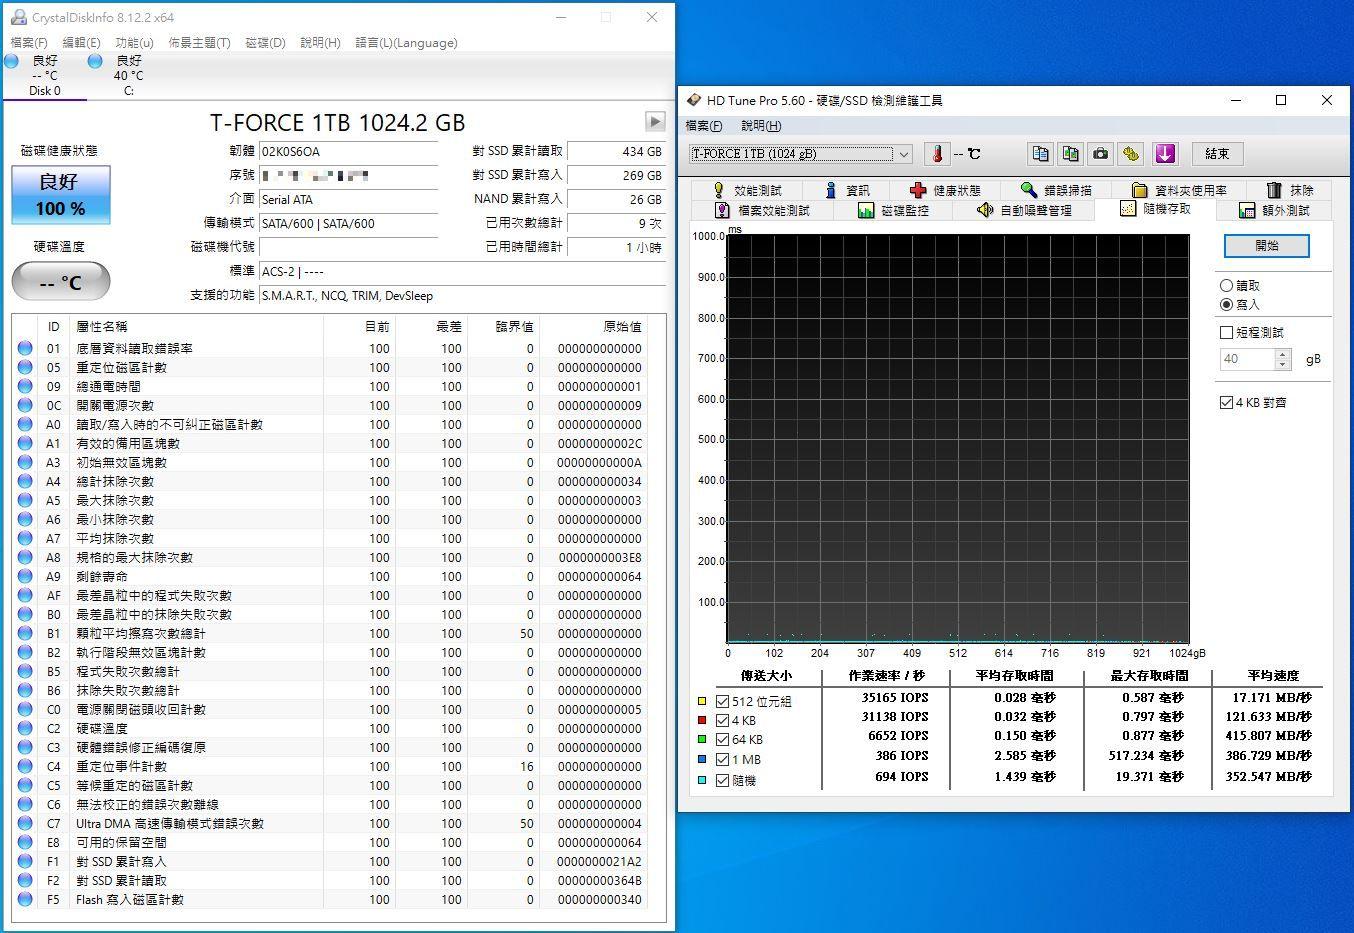 十銓T-FORCE DELTA MAX WHITE RGB SSD固態硬碟-ARGB發光還不夠,白...4016